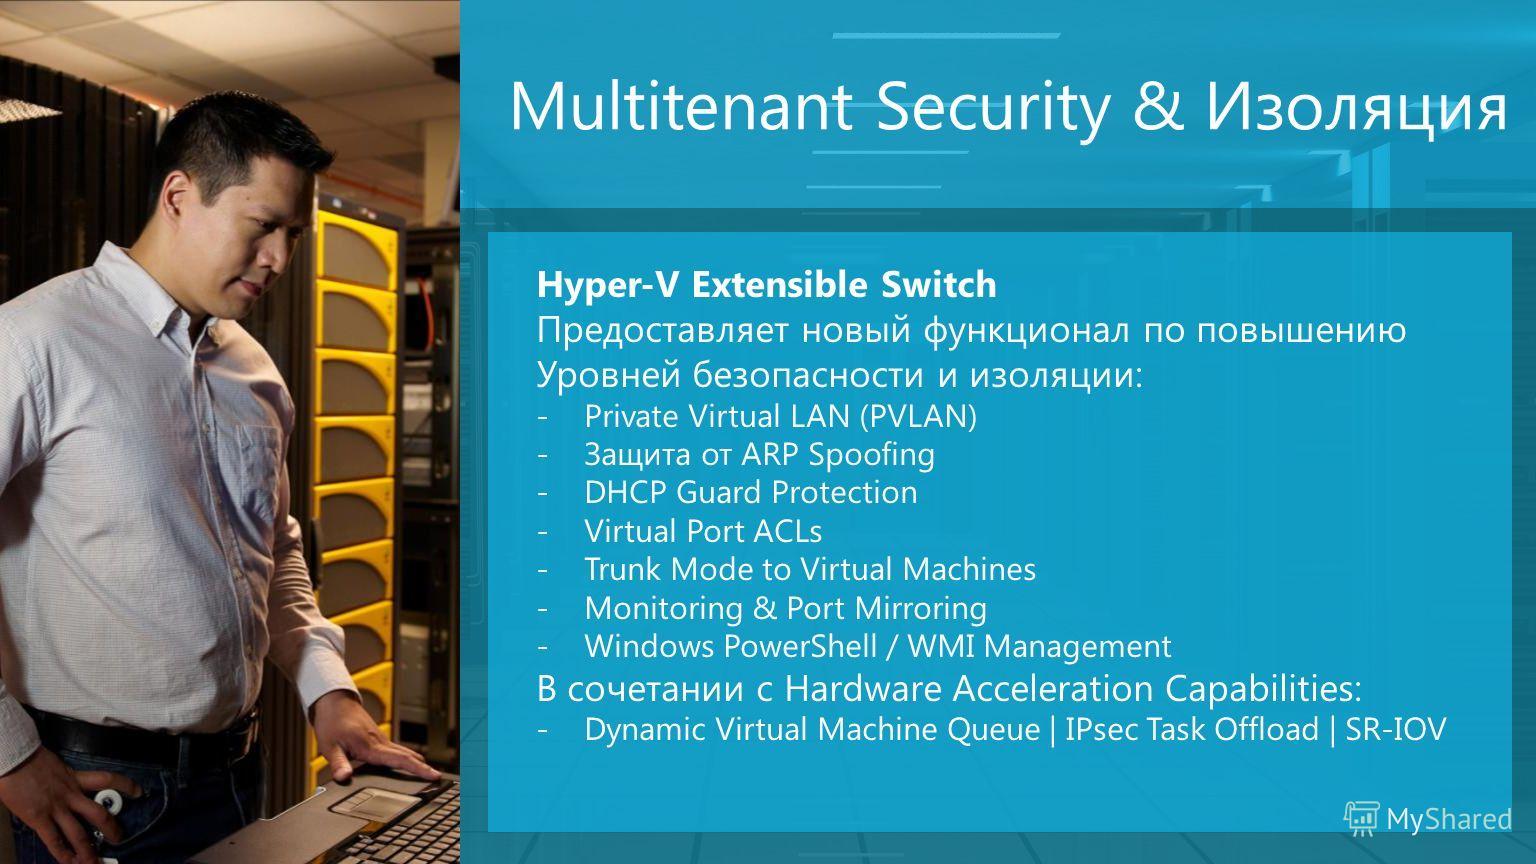 14 Multitenant Security & Изоляция Hyper-V Extensible Switch Предоставляет новый функционал по повышению Уровней безопасности и изоляции: -Private Virtual LAN (PVLAN) -Защита от ARP Spoofing -DHCP Guard Protection -Virtual Port ACLs -Trunk Mode to Vi